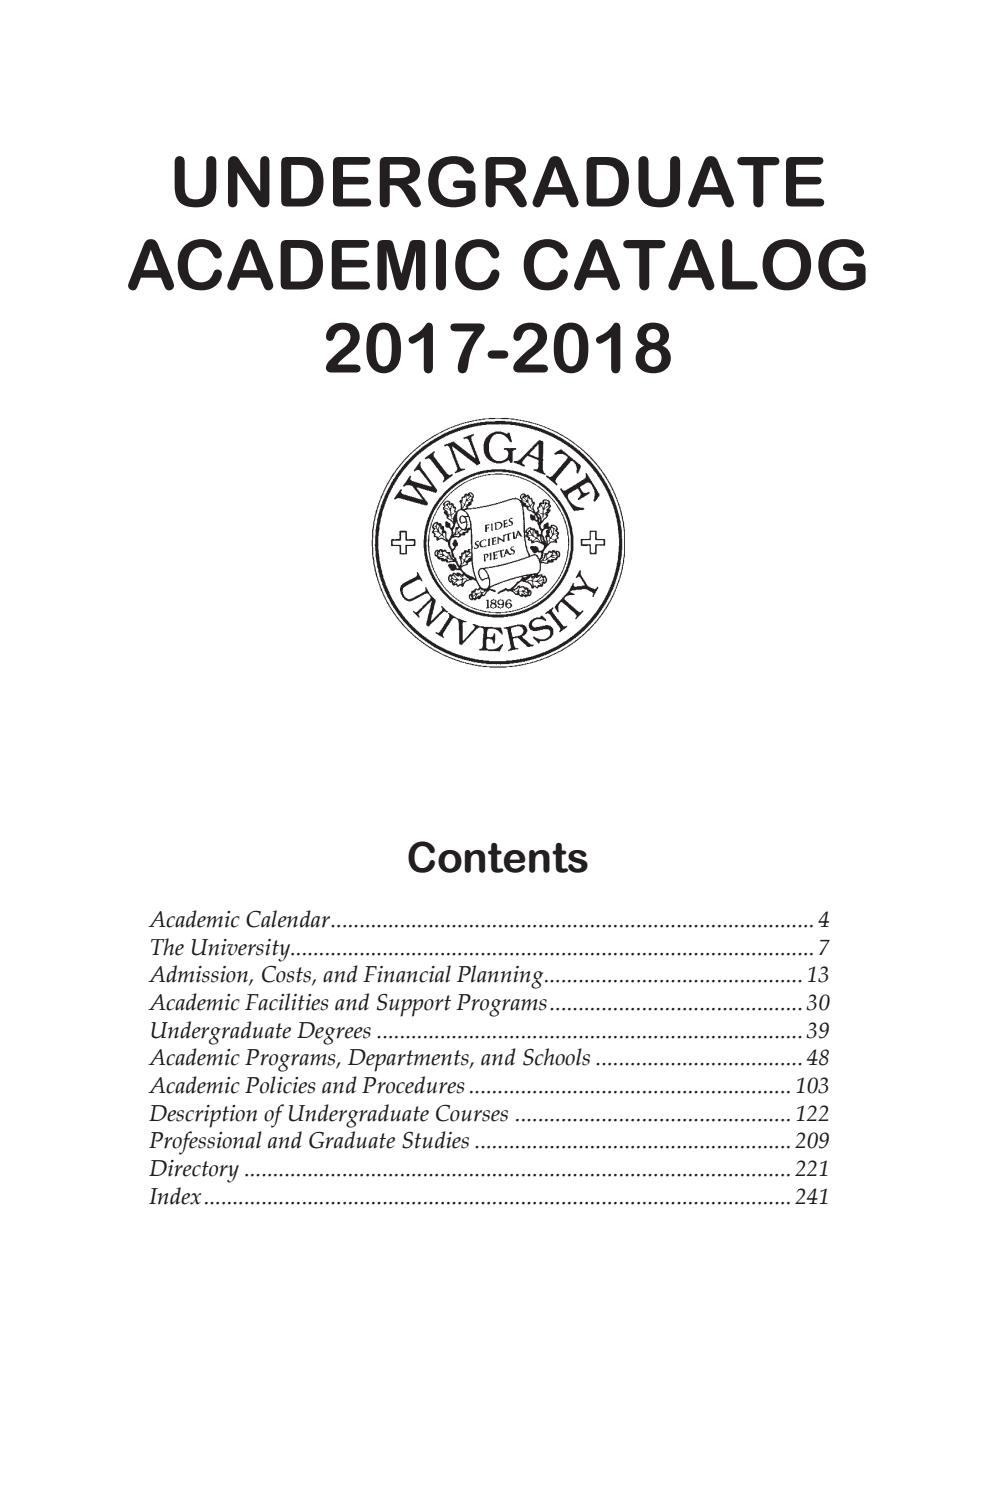 2017 18 Undergraduate Catalogwingate University - Issuu Pertaining To Delaware State Calendar